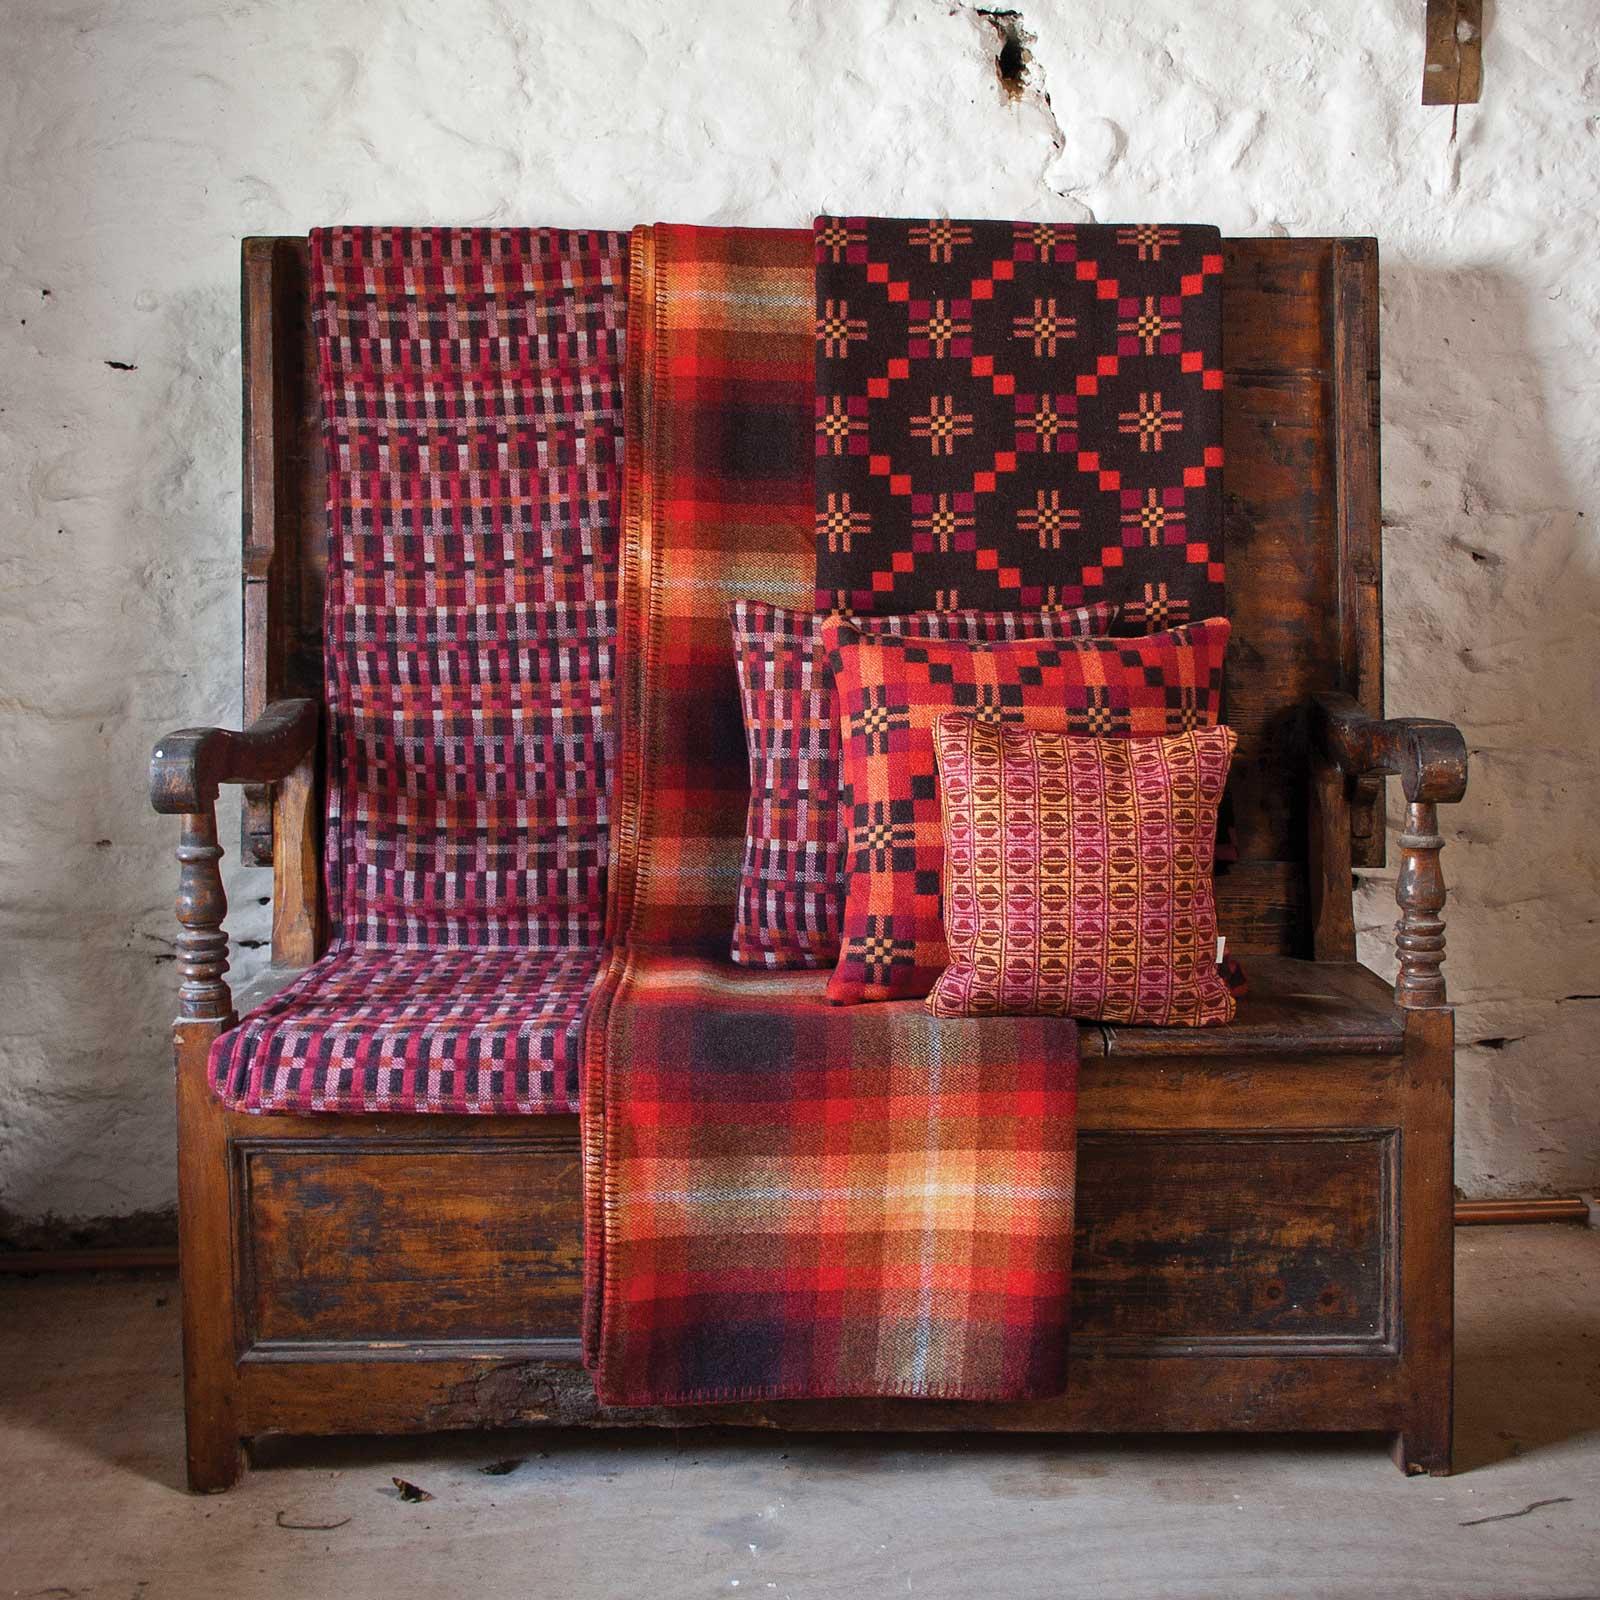 ebay uk christmas chair covers santa bed bath and beyond melin tregwynt ember 6870 crop 1600 jpg